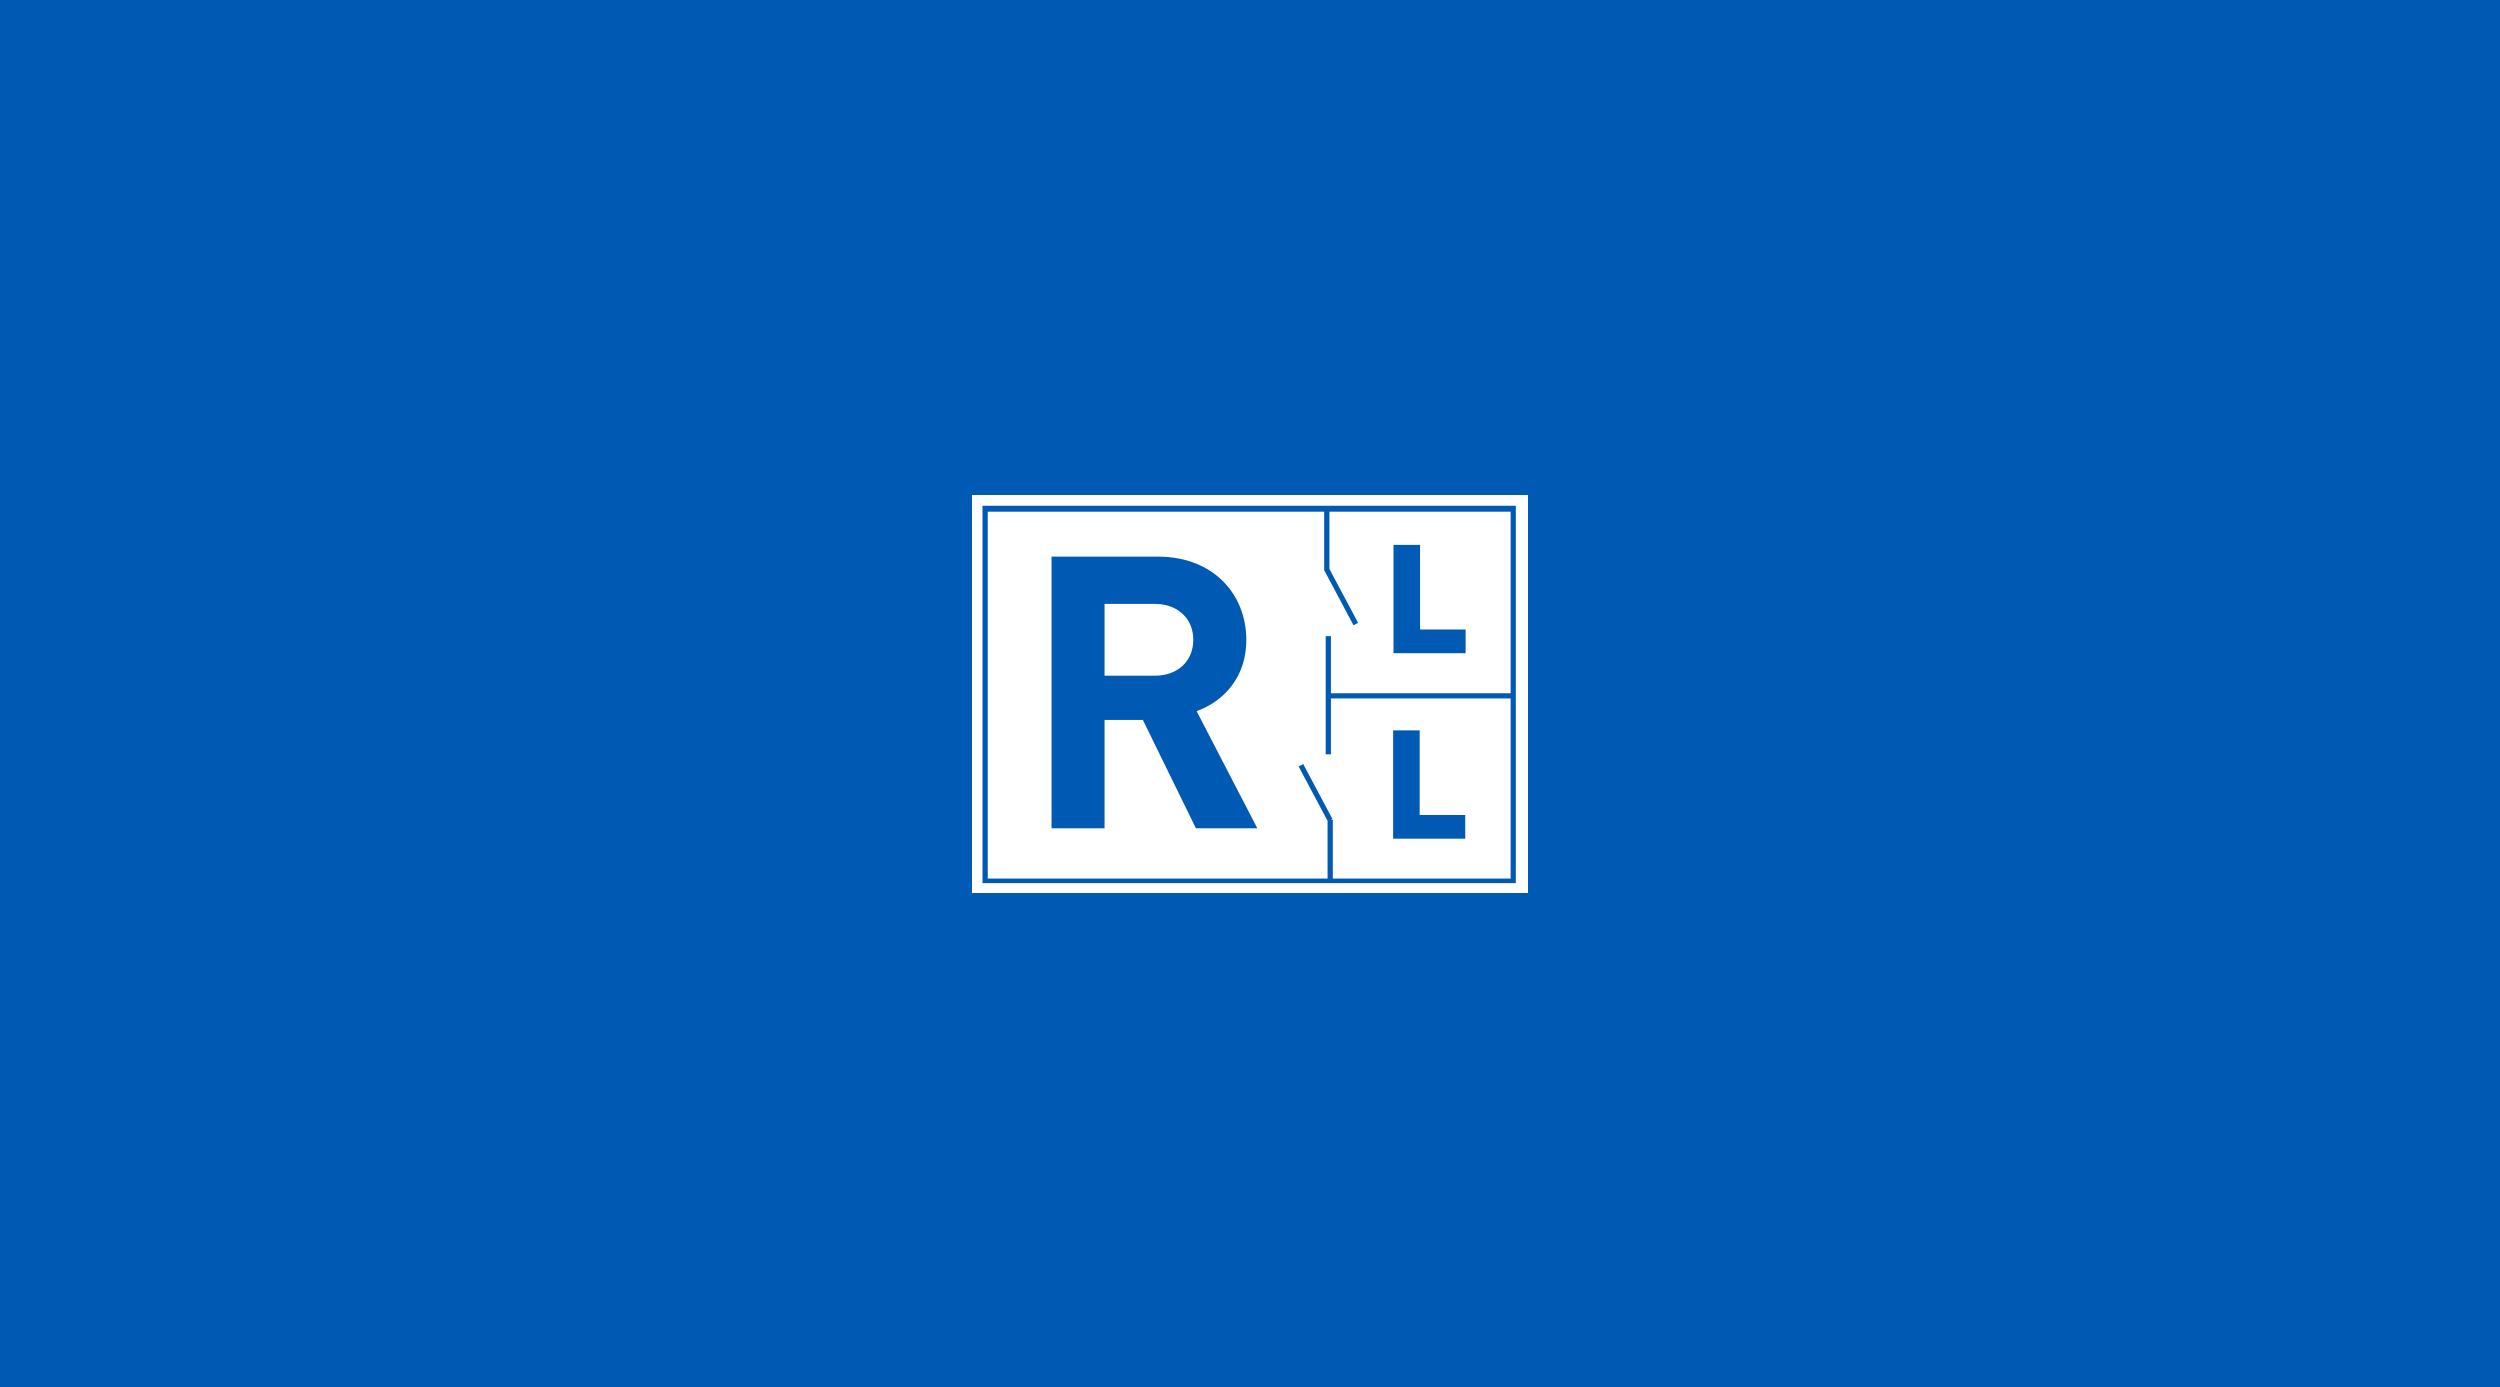 Logo3.jpg